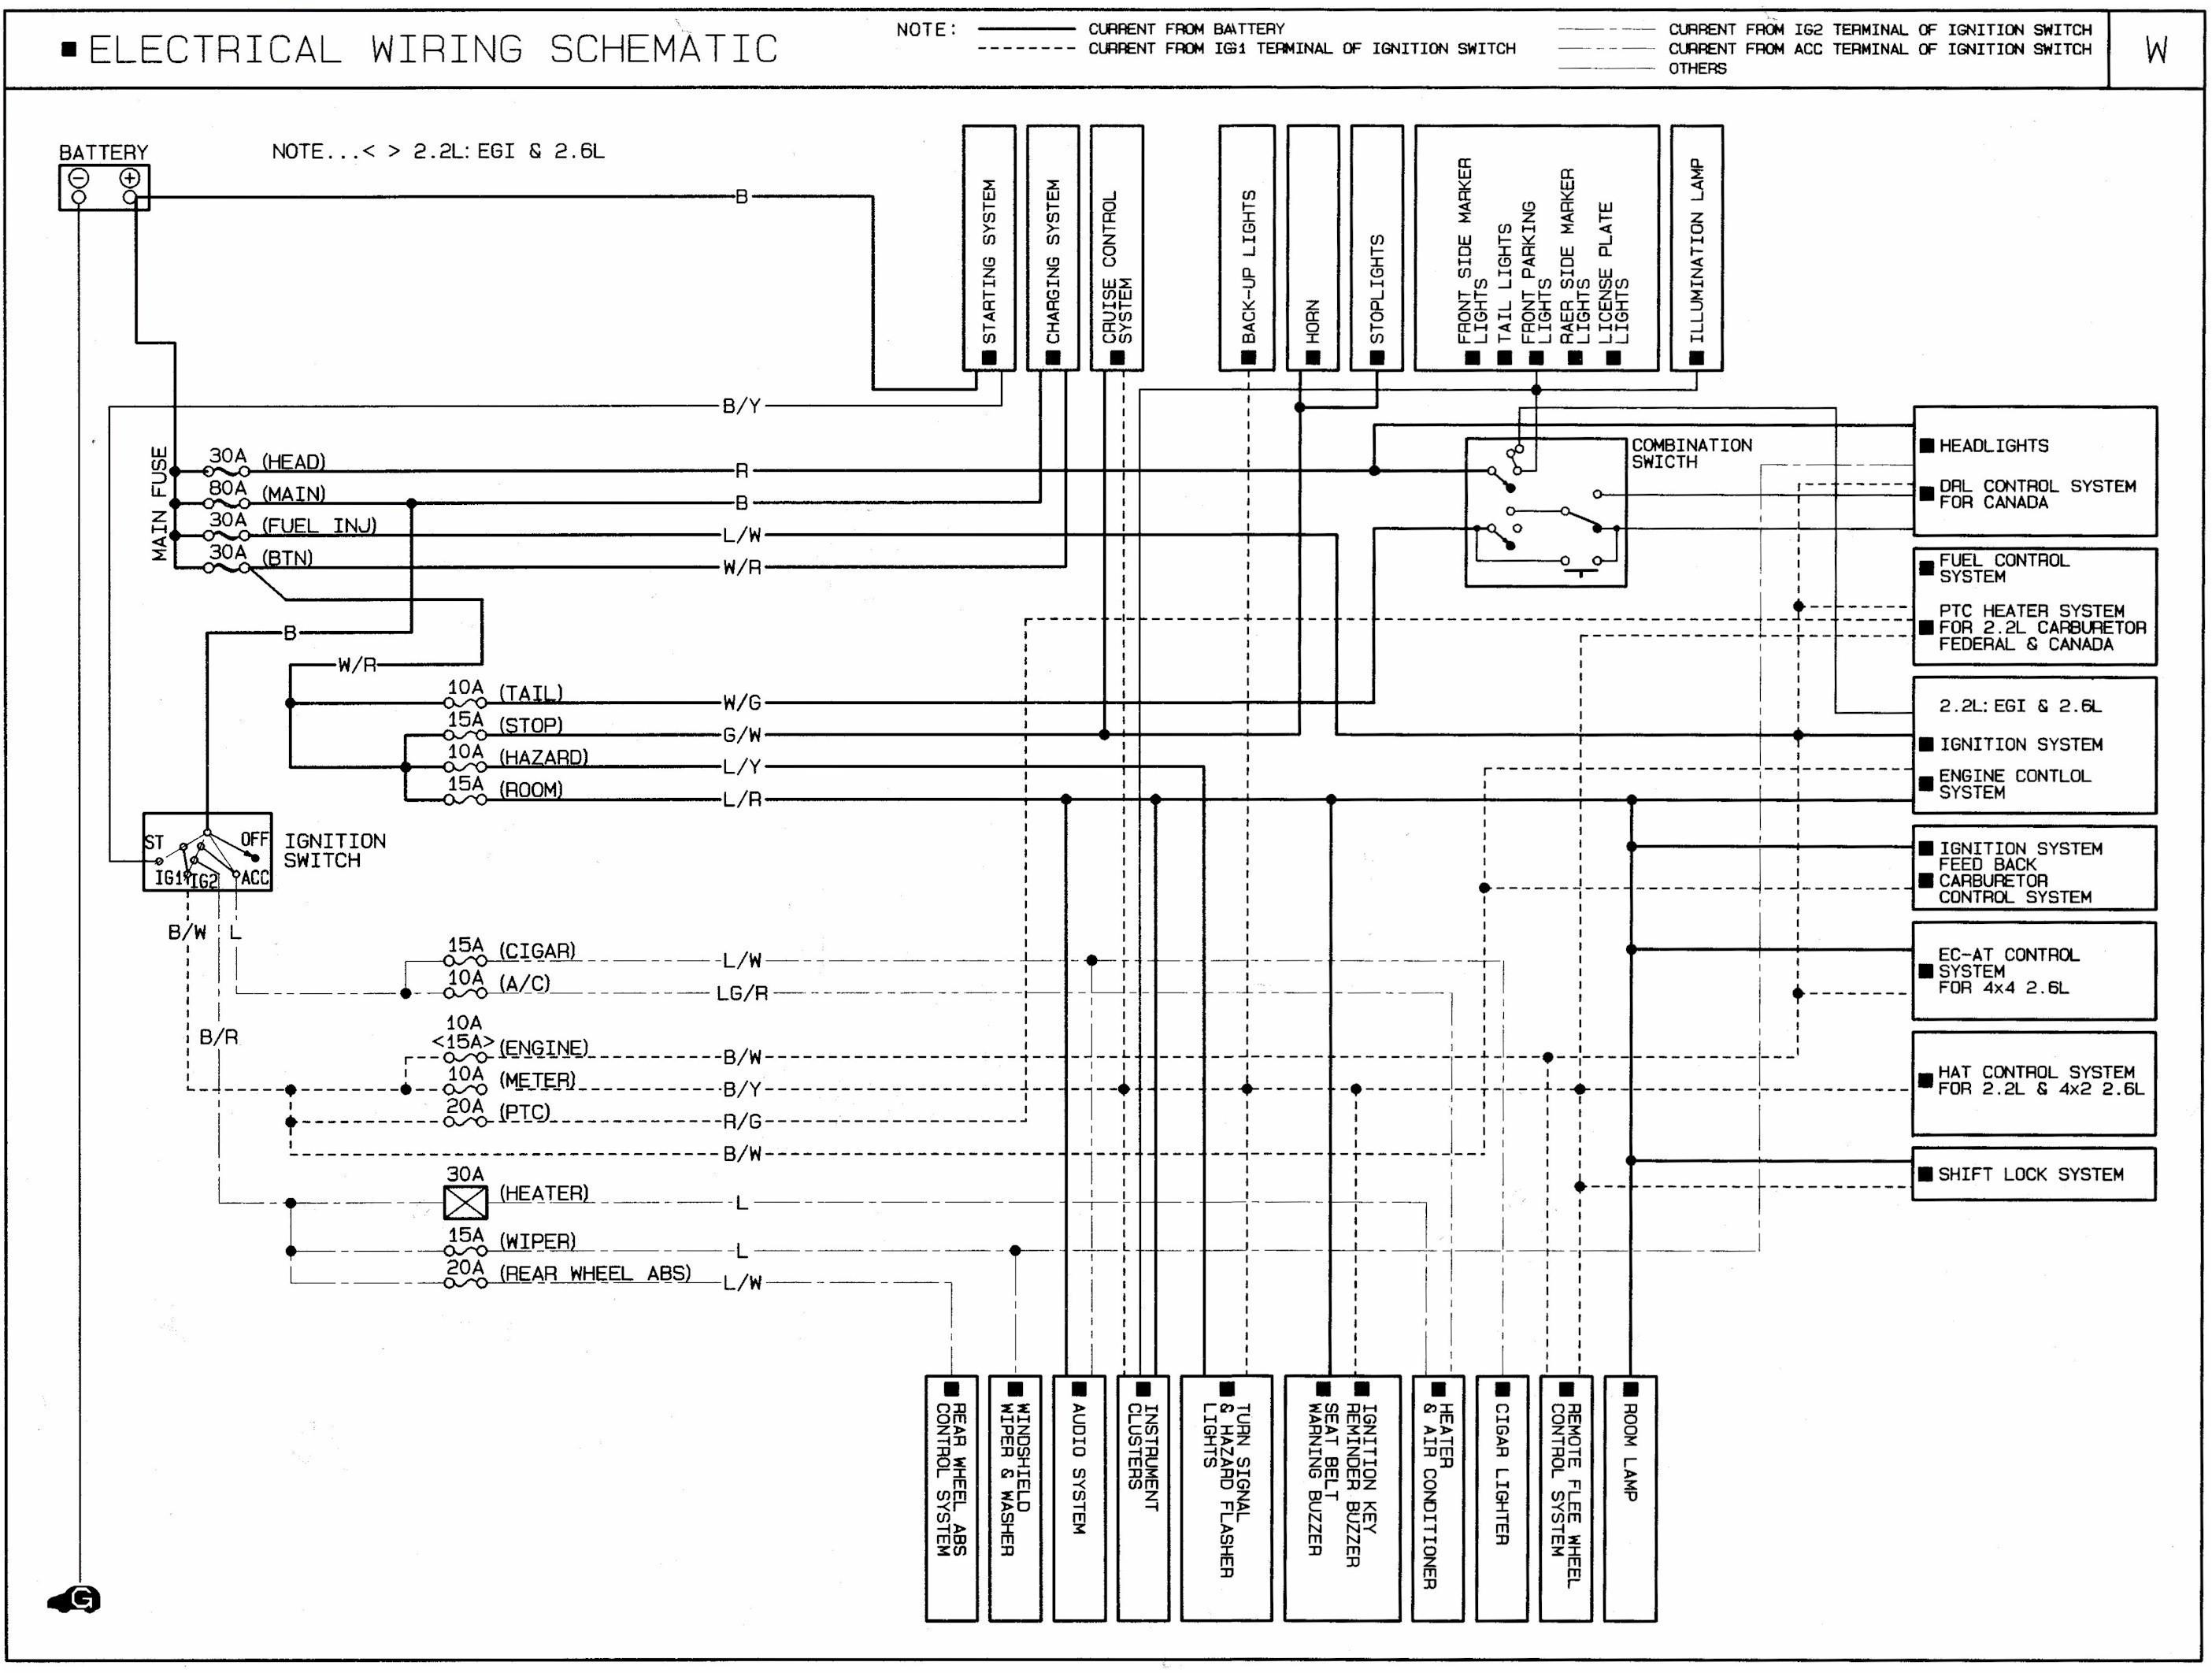 2001 Mazda Tribute V6 Engine Diagram Wiper Switch Wiring Diagram 1996 626 Mazda Worksheet and Wiring Of 2001 Mazda Tribute V6 Engine Diagram